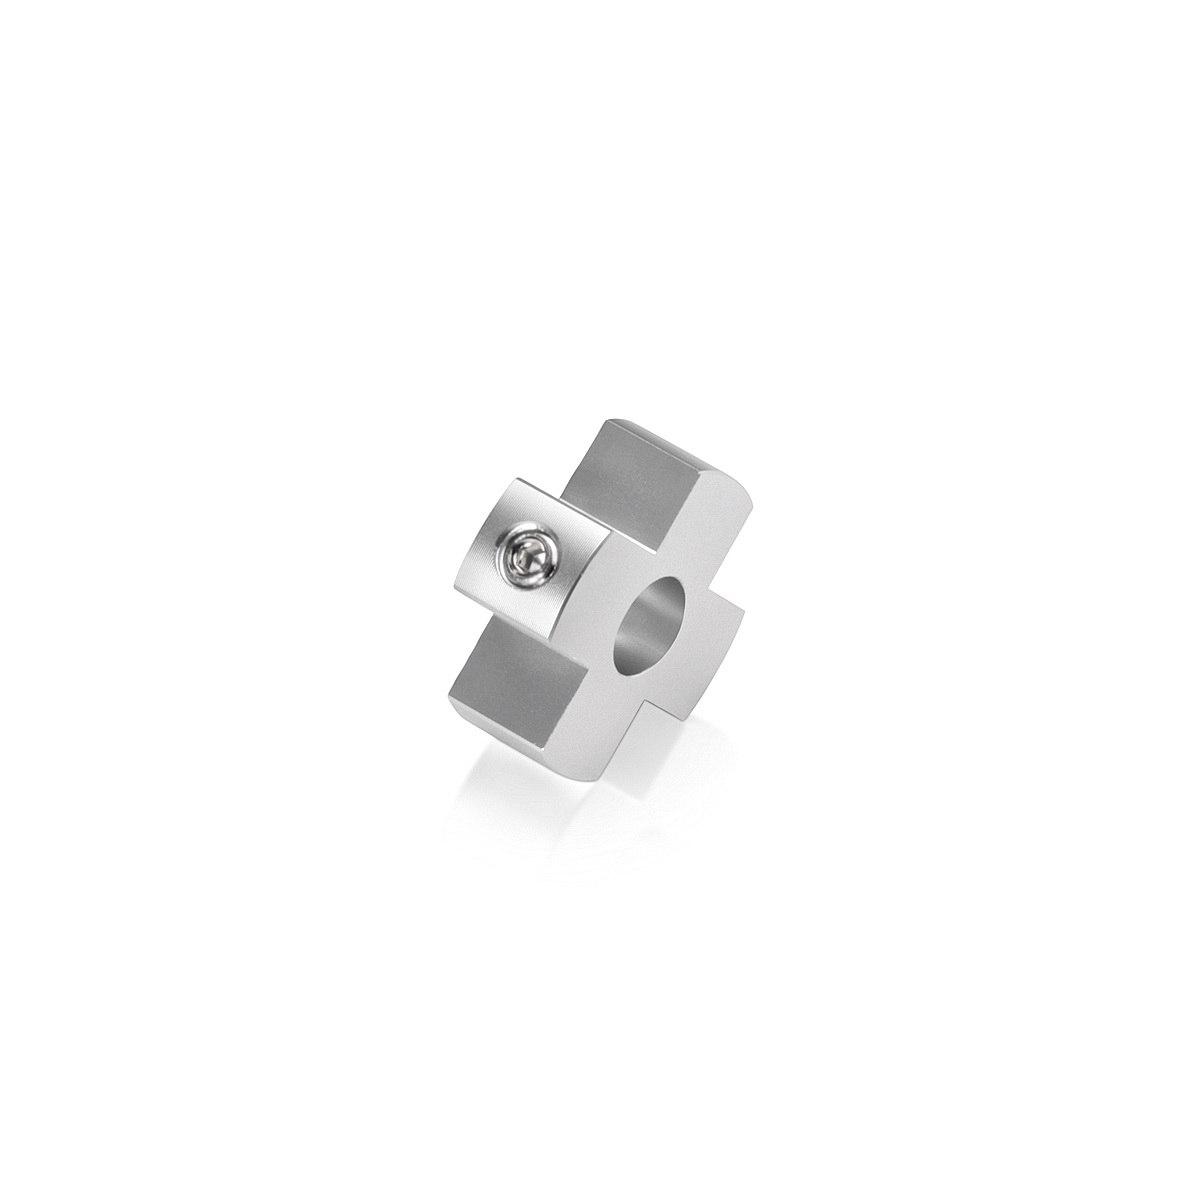 4-Way Standoffs Hub, Diameter: 1'', Thickness: 3/8'', Clear Anodized Aluminum